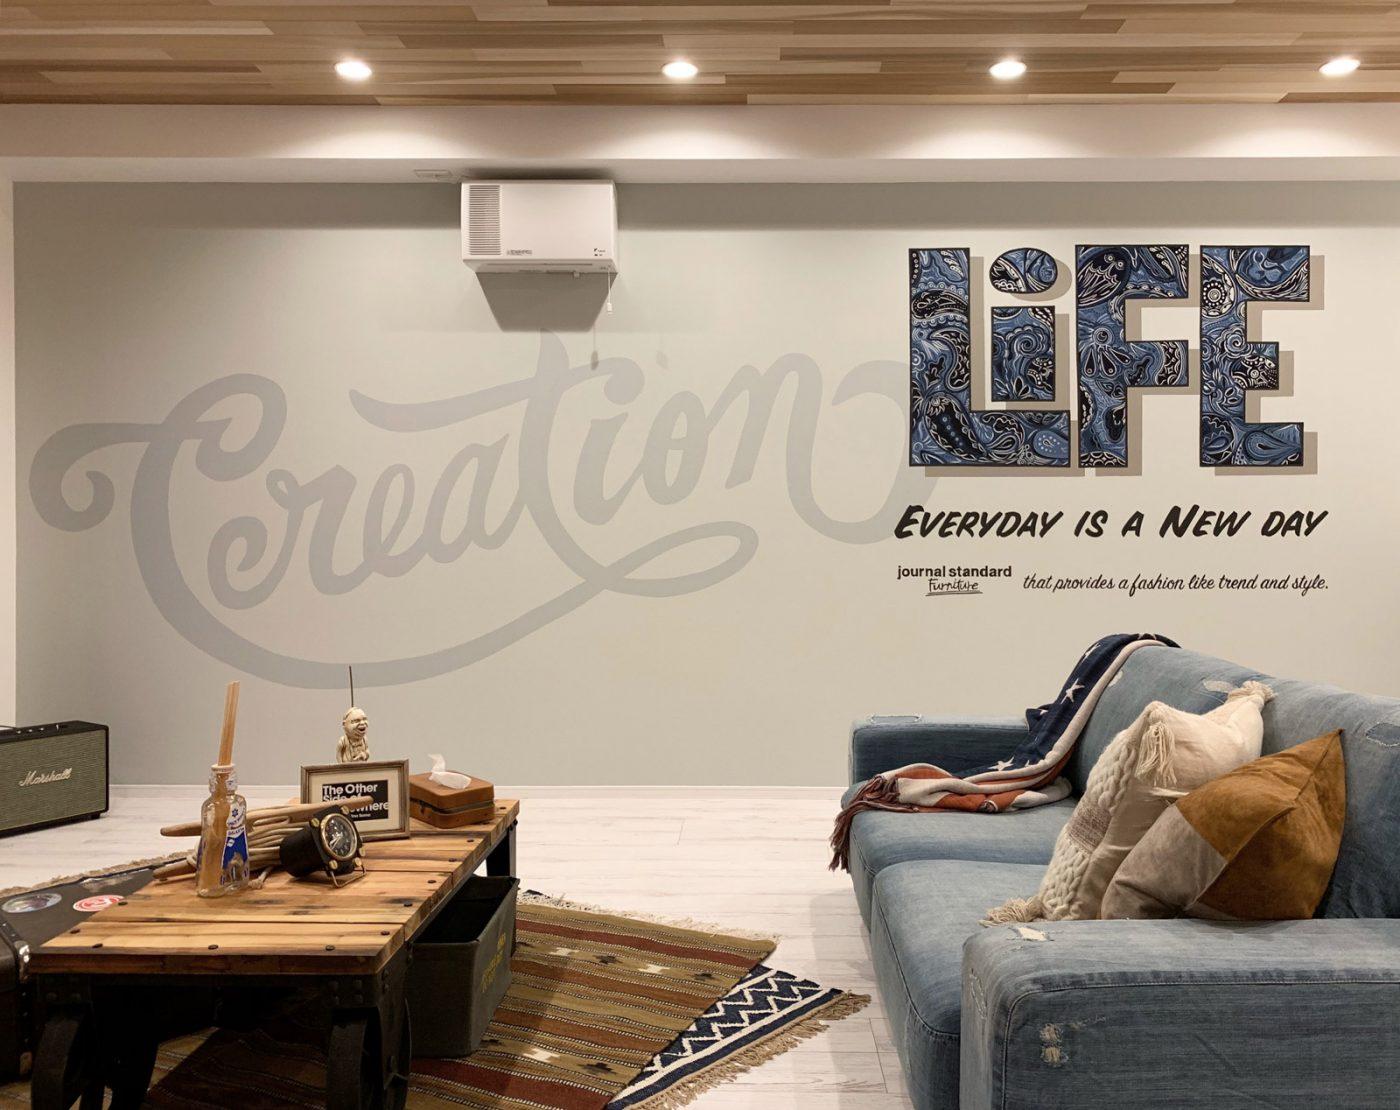 Shinkoiwa Showroom Supervised by journal standard Furniture